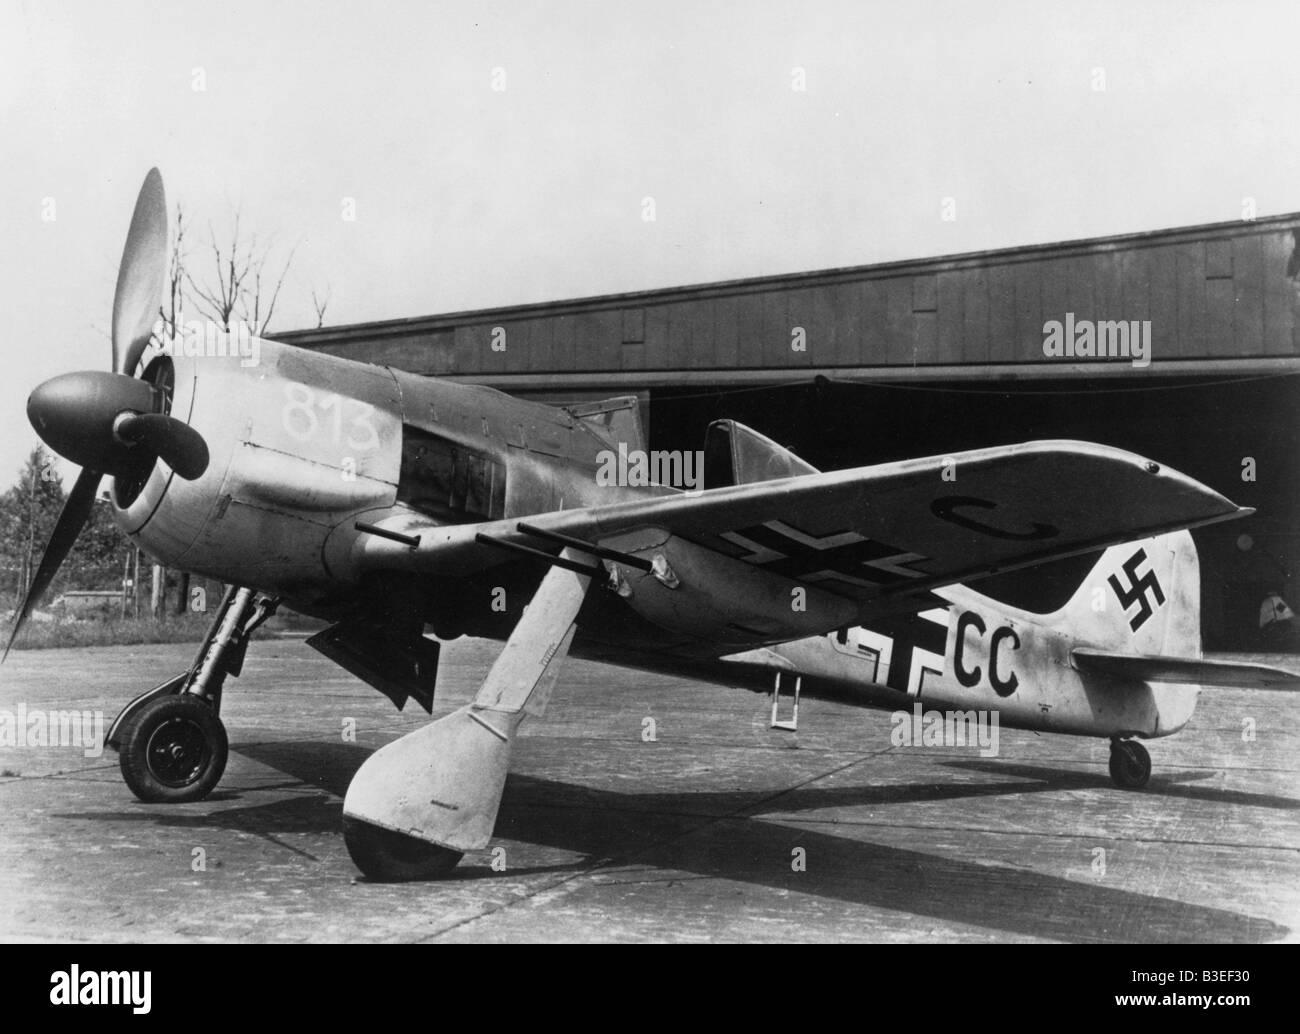 Military / Luftwaffe / Focke-Wulf FW 190 - Stock Image